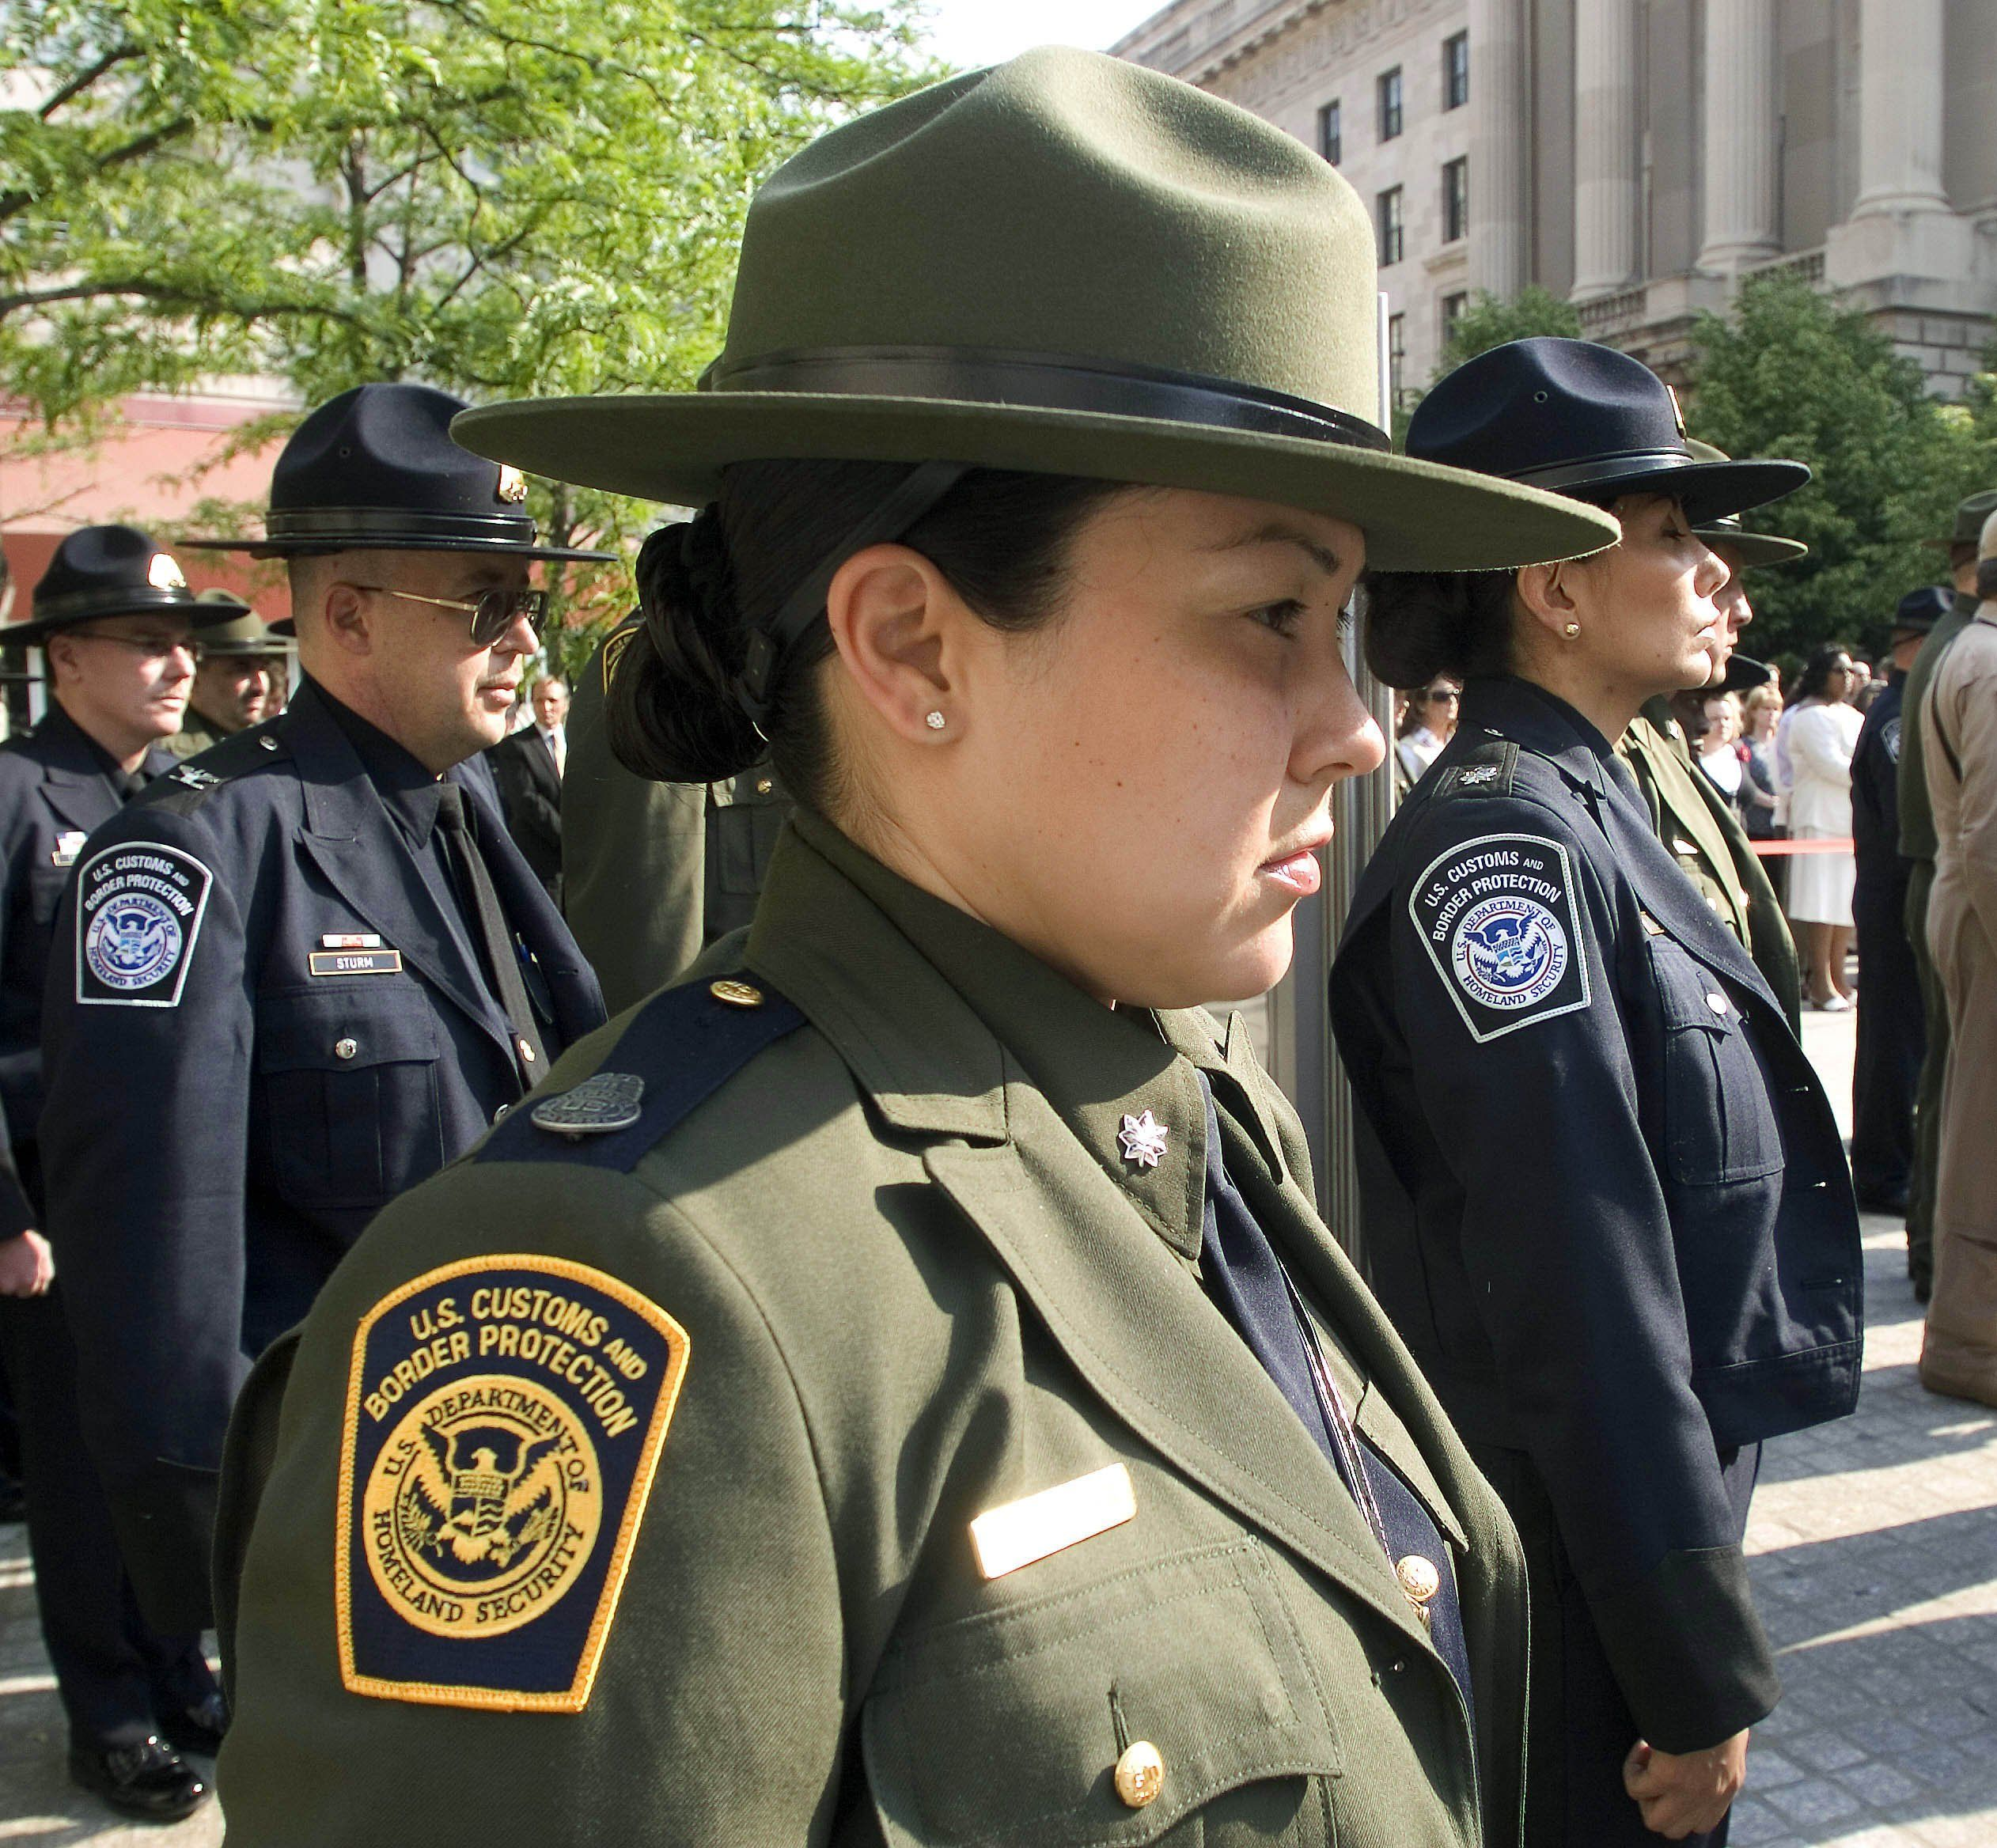 Chipmunk reccomend Ohio state patrol assholes